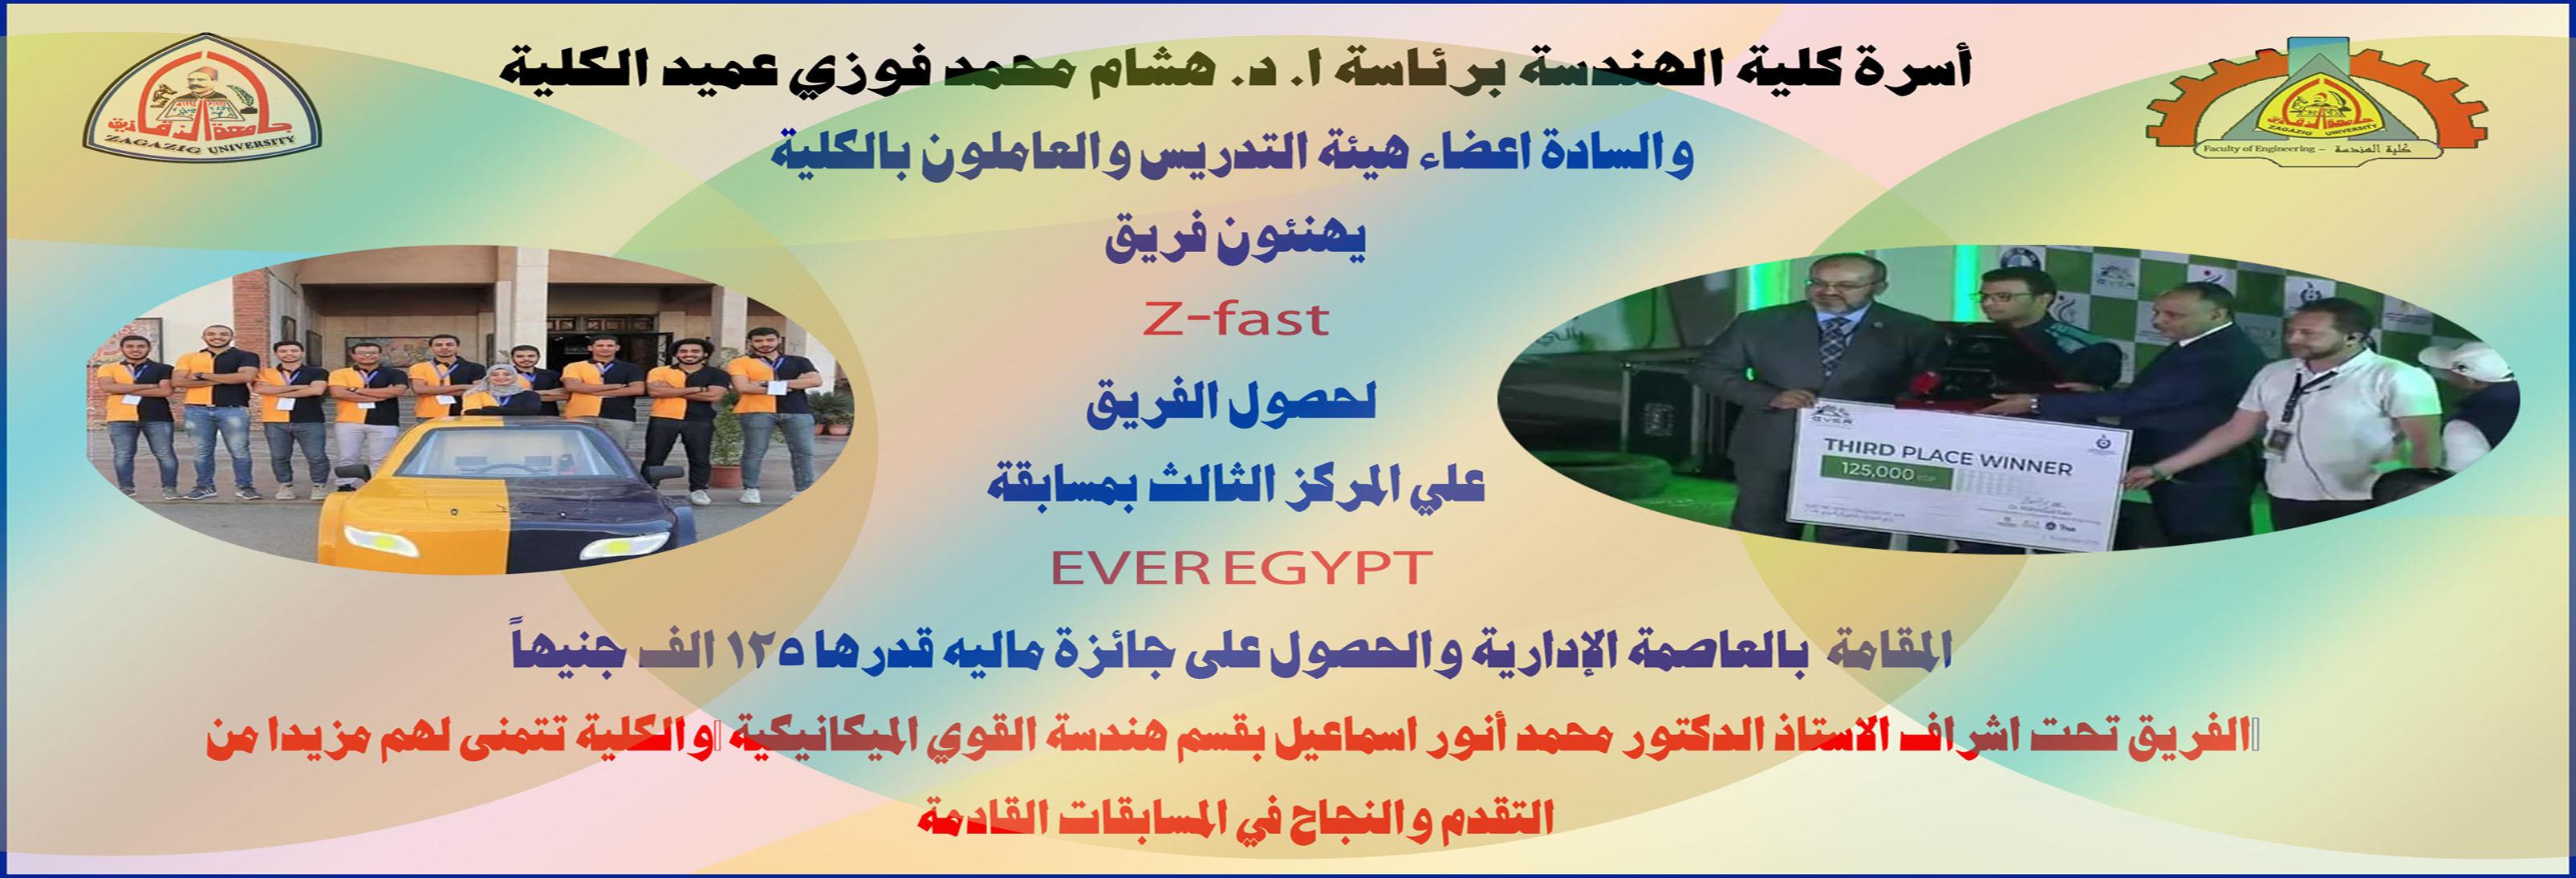 Z-fast   حصول الفريق  علي المركز الثالث بمسابقة  EVER EGYPT  المقامة  بالعاصمة الإدارية والحصول على جائزة ماليه قدرها 521 الف جنيهاً